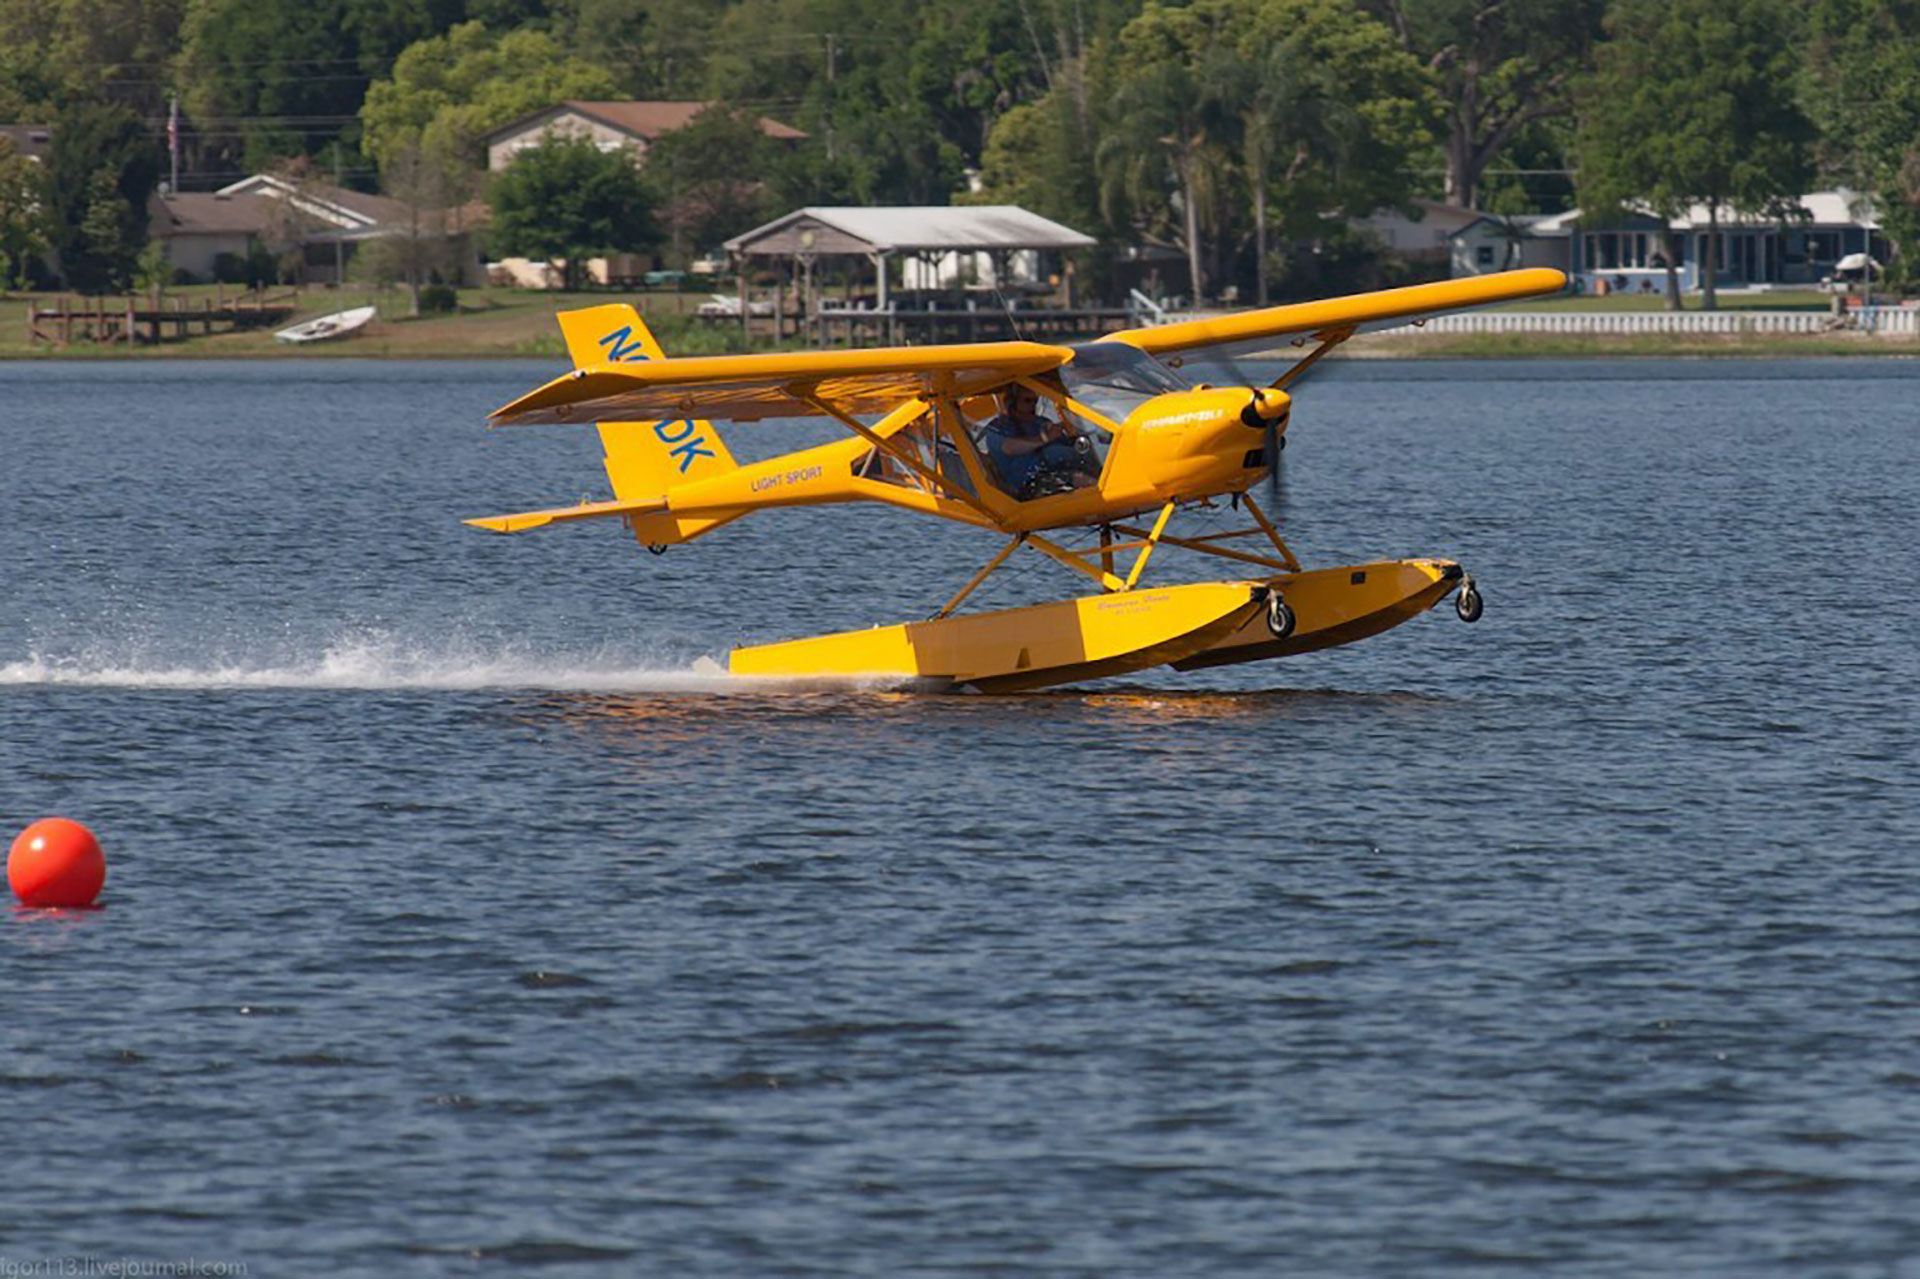 Aeroprakt A22 L2 | ATA by Pelletier - Avignon